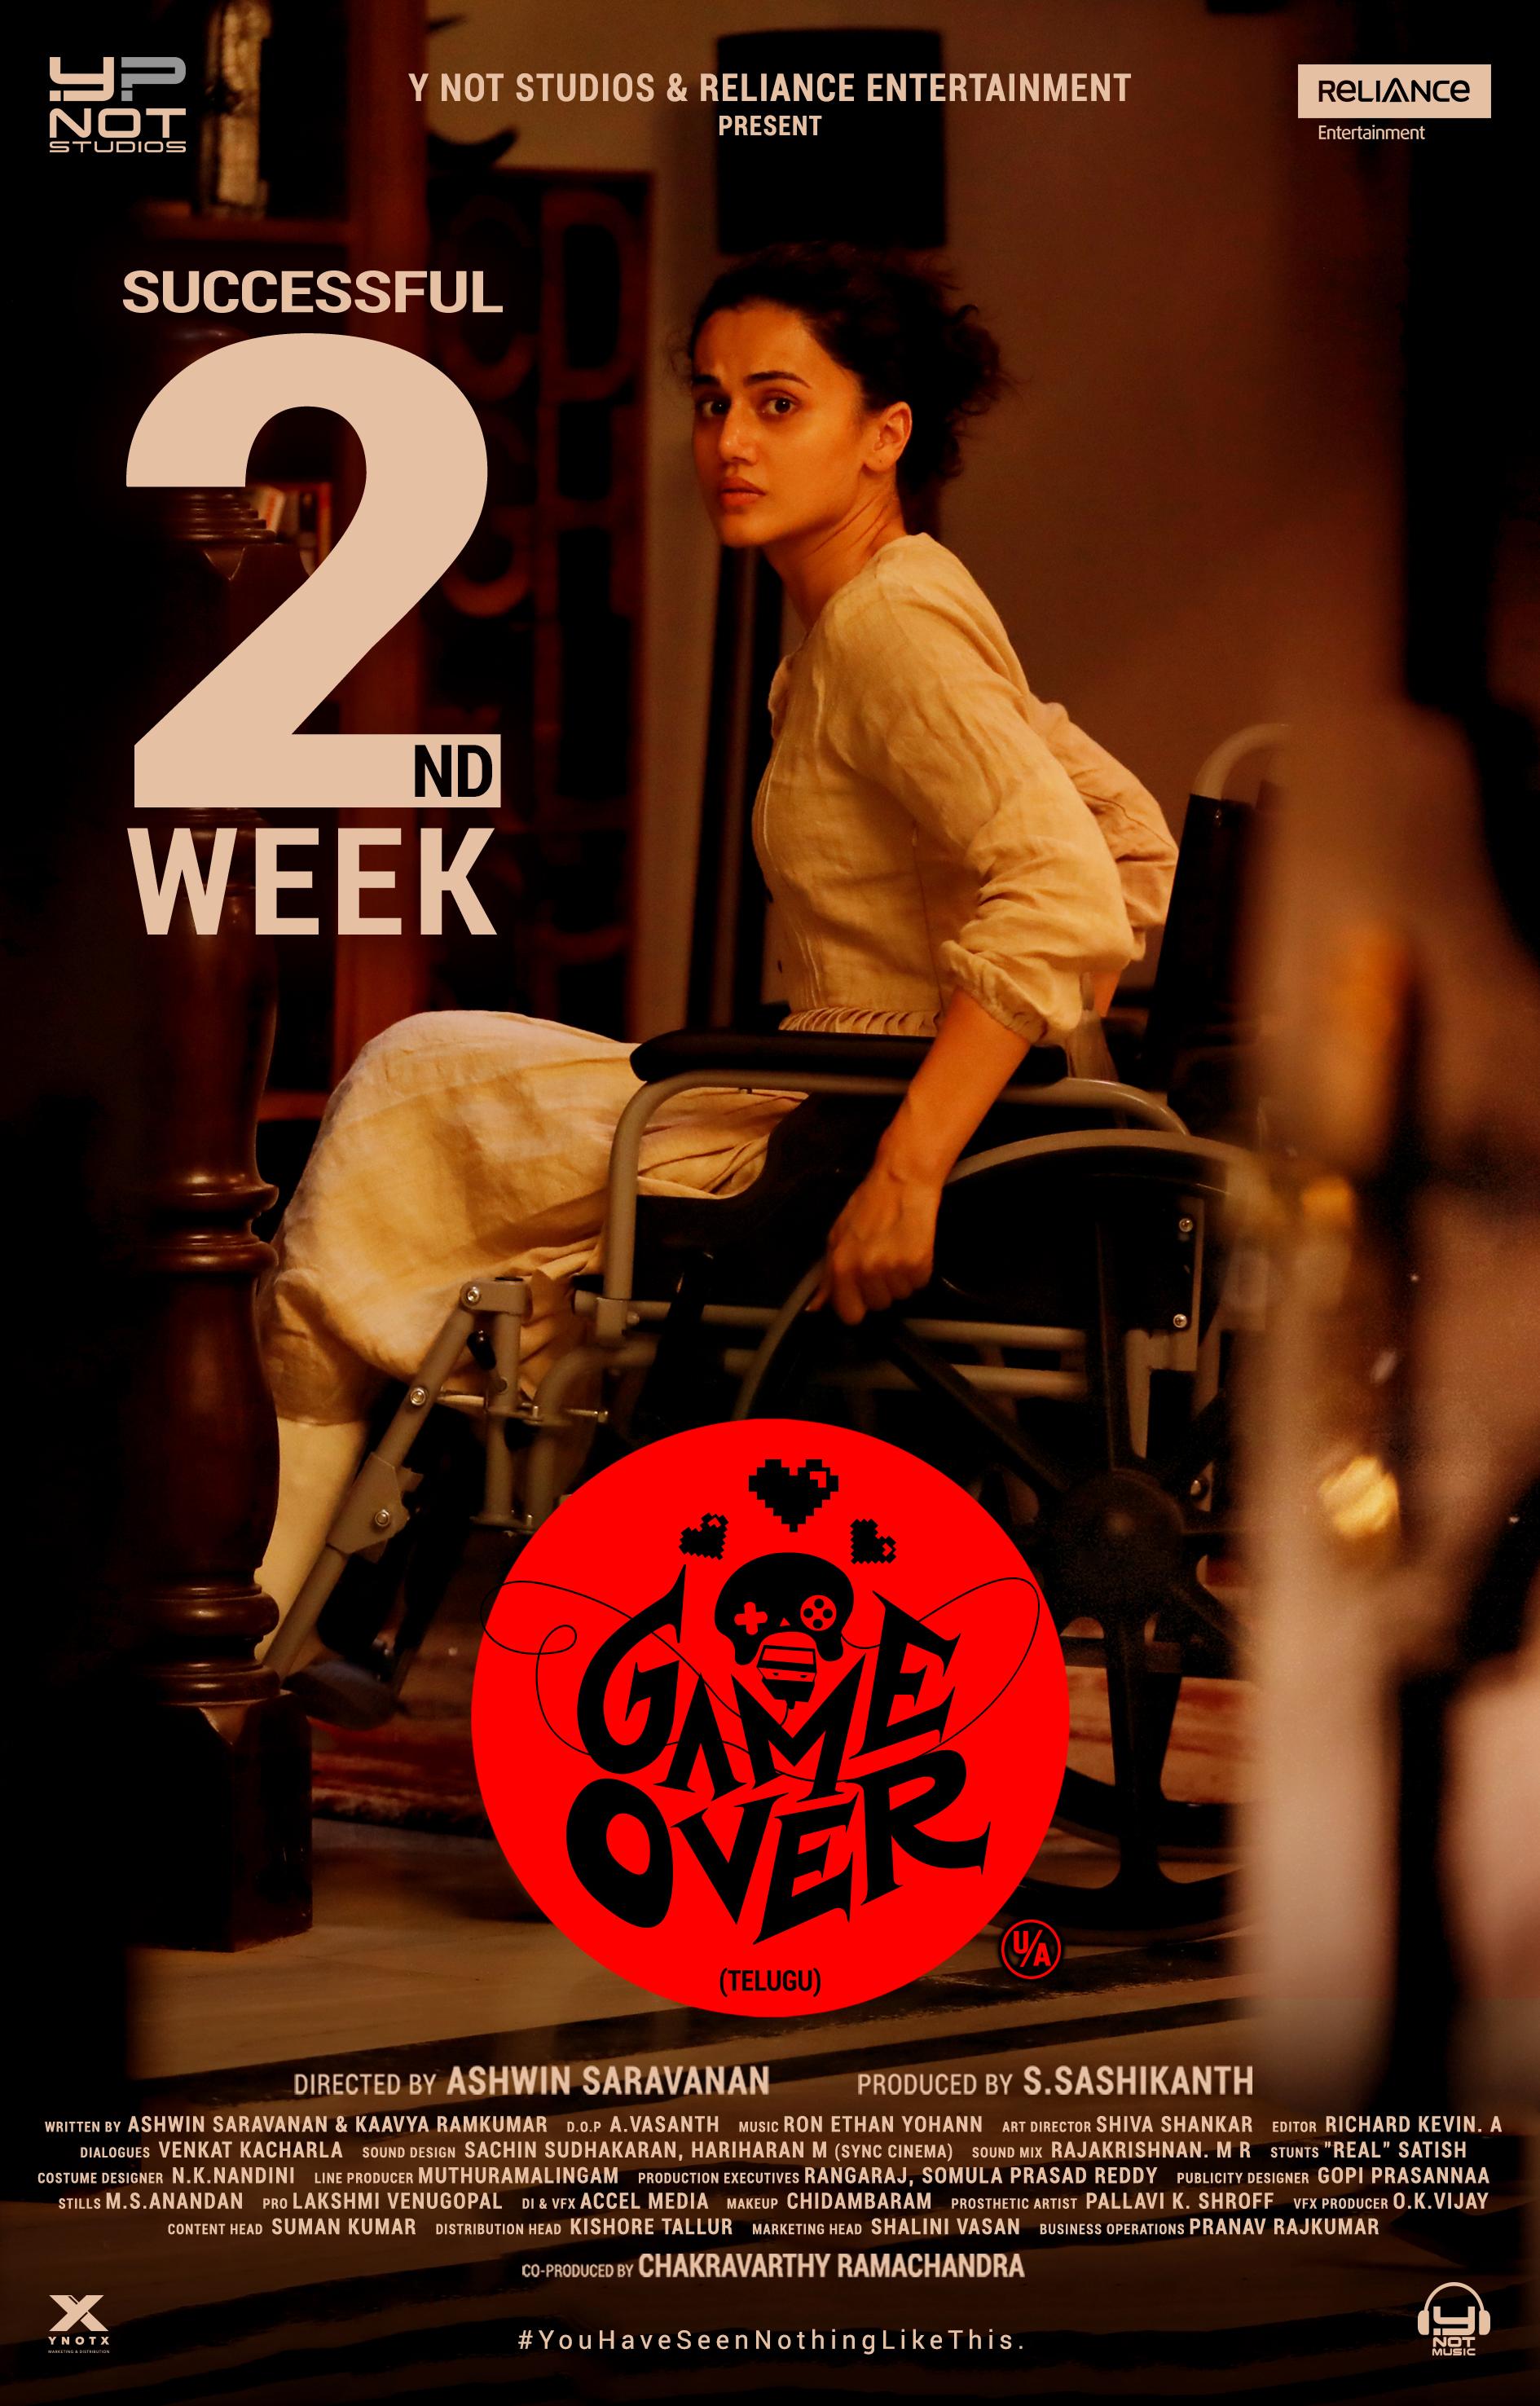 GameOver-ENGTelugu-June21-01